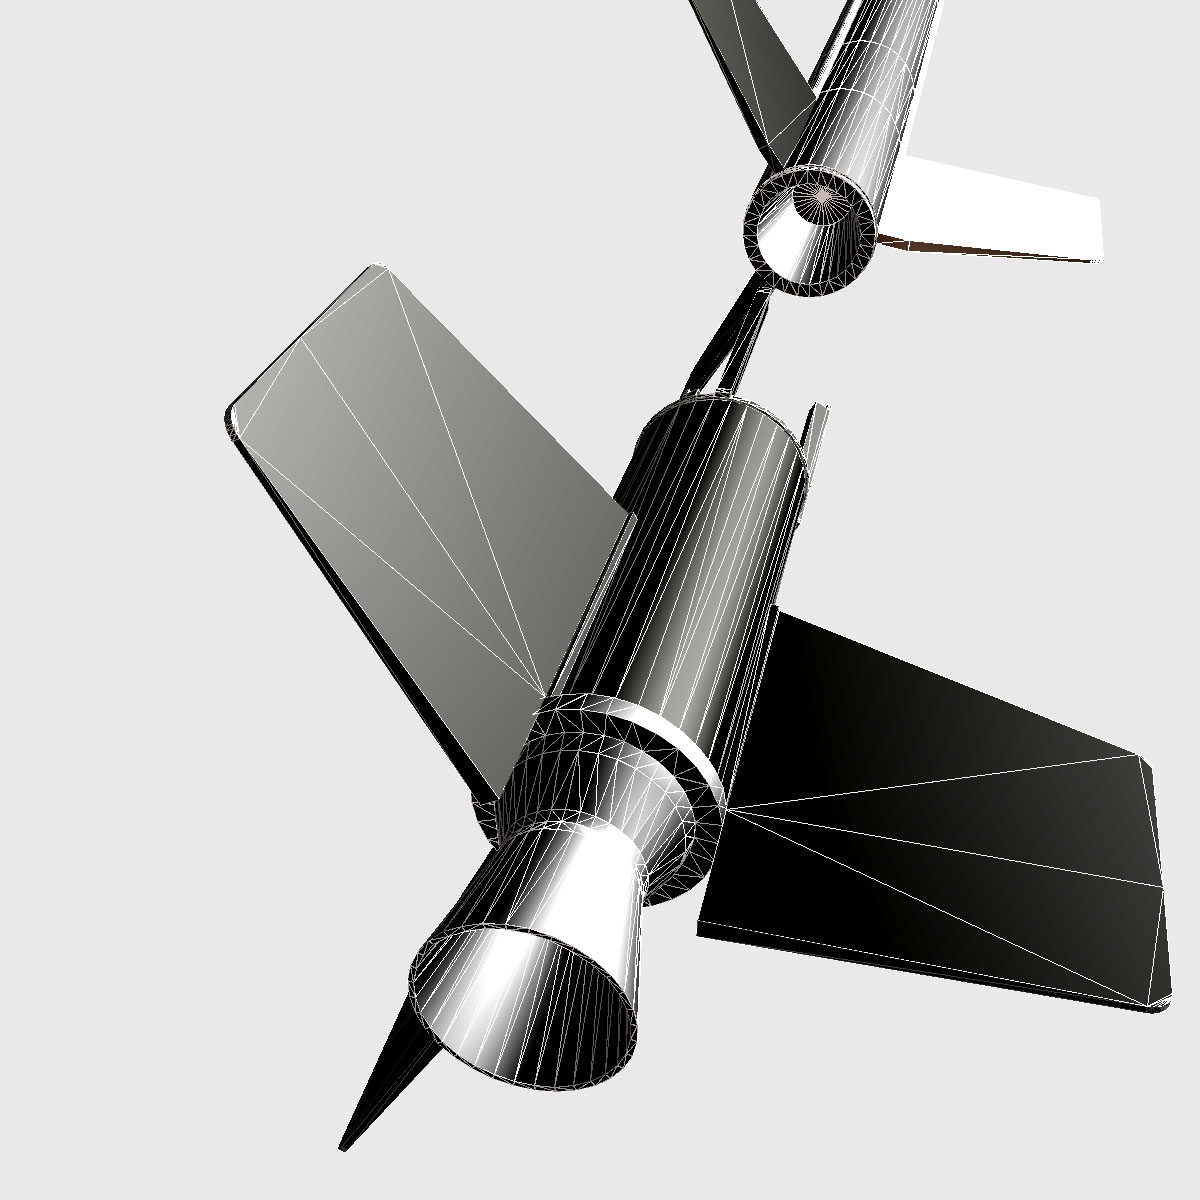 nasa aerobee 100 rocket 3d model 3ds dxf fbx blend cob dae x  obj 158444